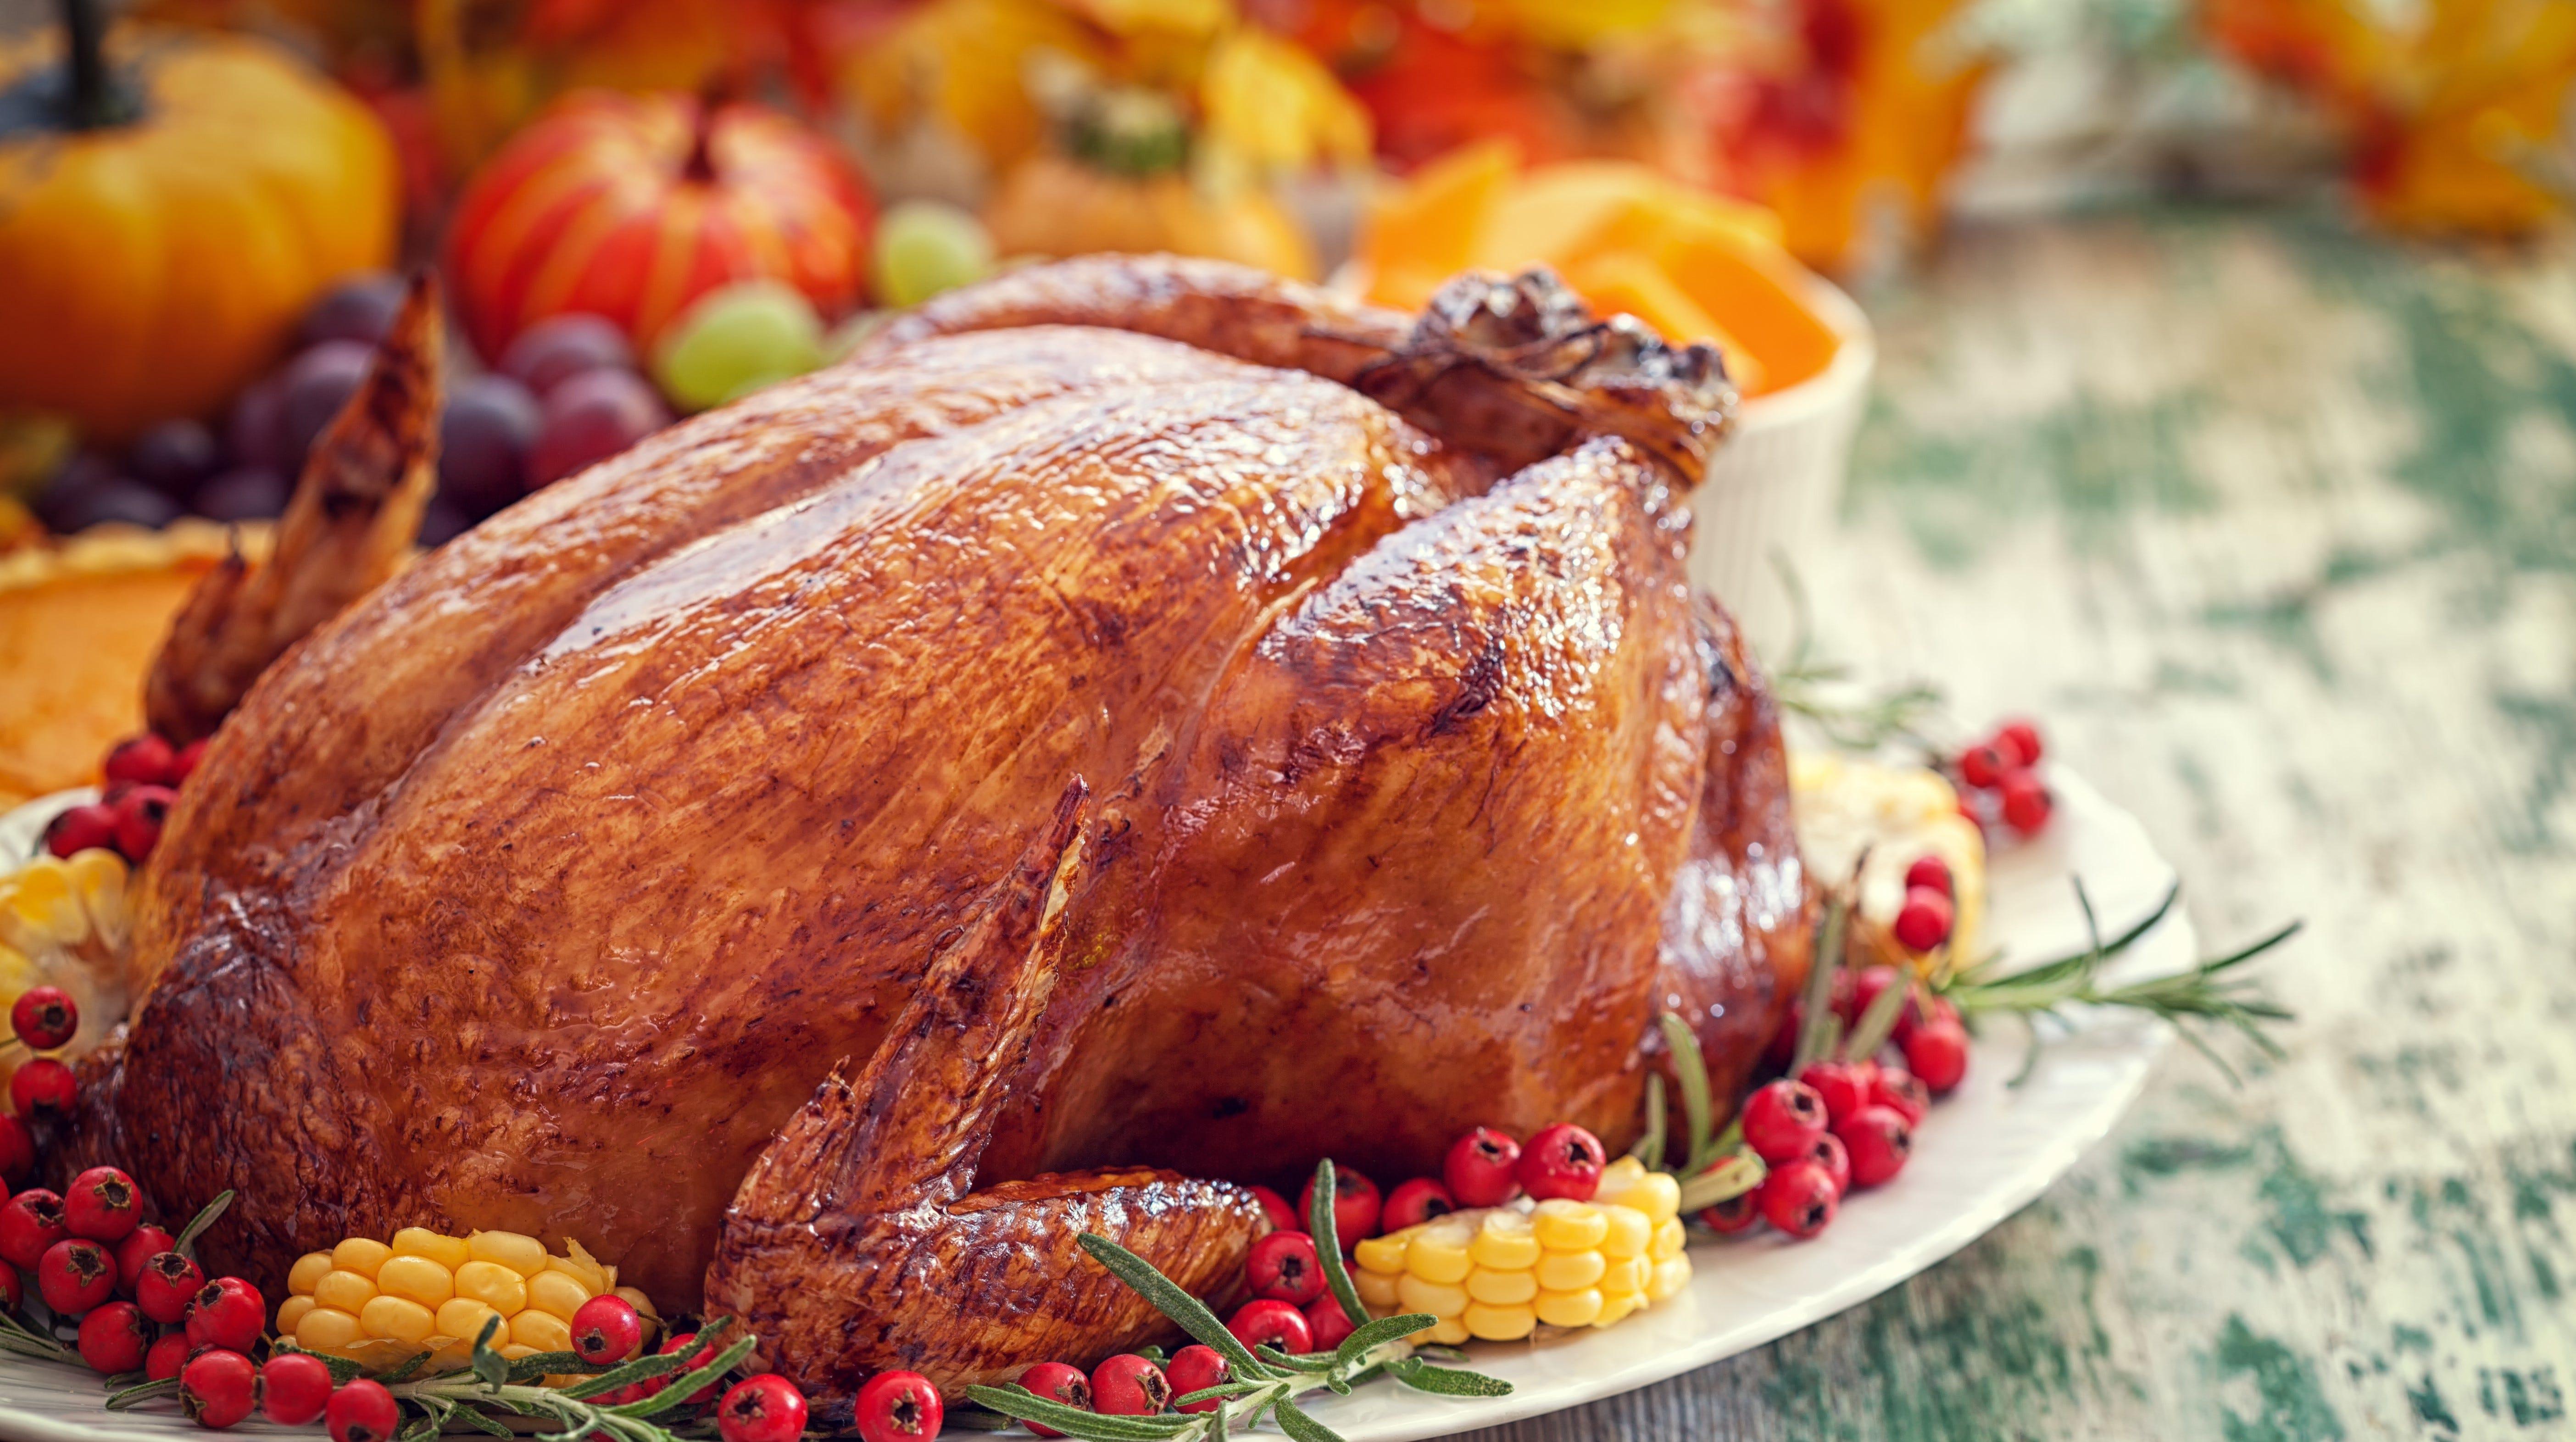 The Vineland Salvation Army's annual Turkey Drive...